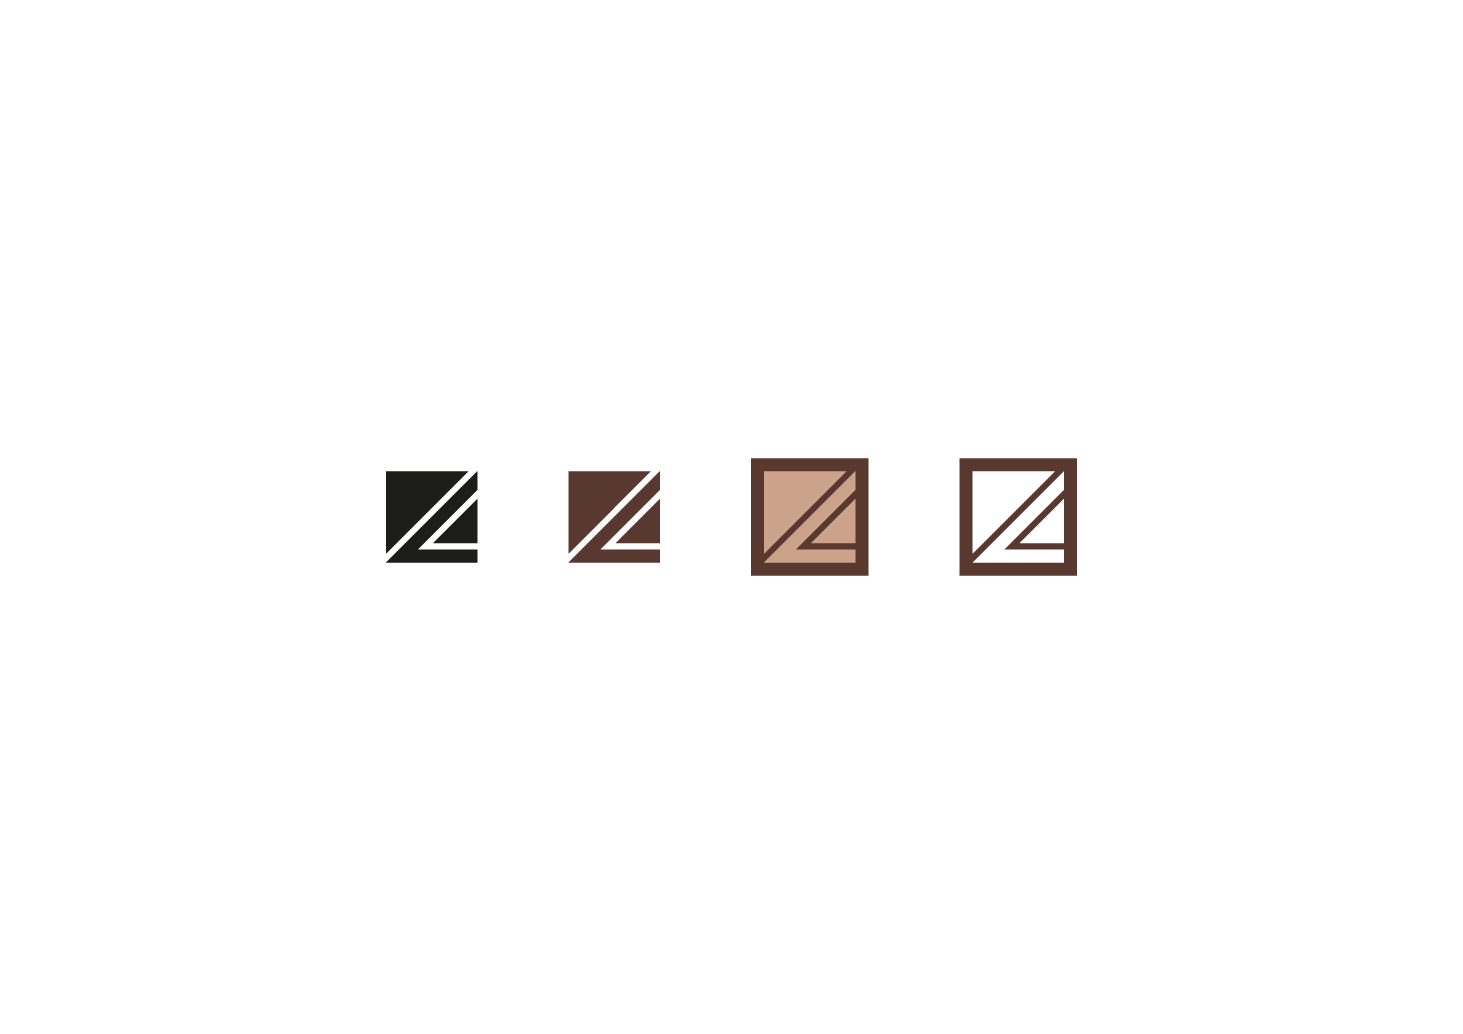 Логотип, фавикон и визитка для компании Винком Пласт  фото f_2435c37915538a2c.png